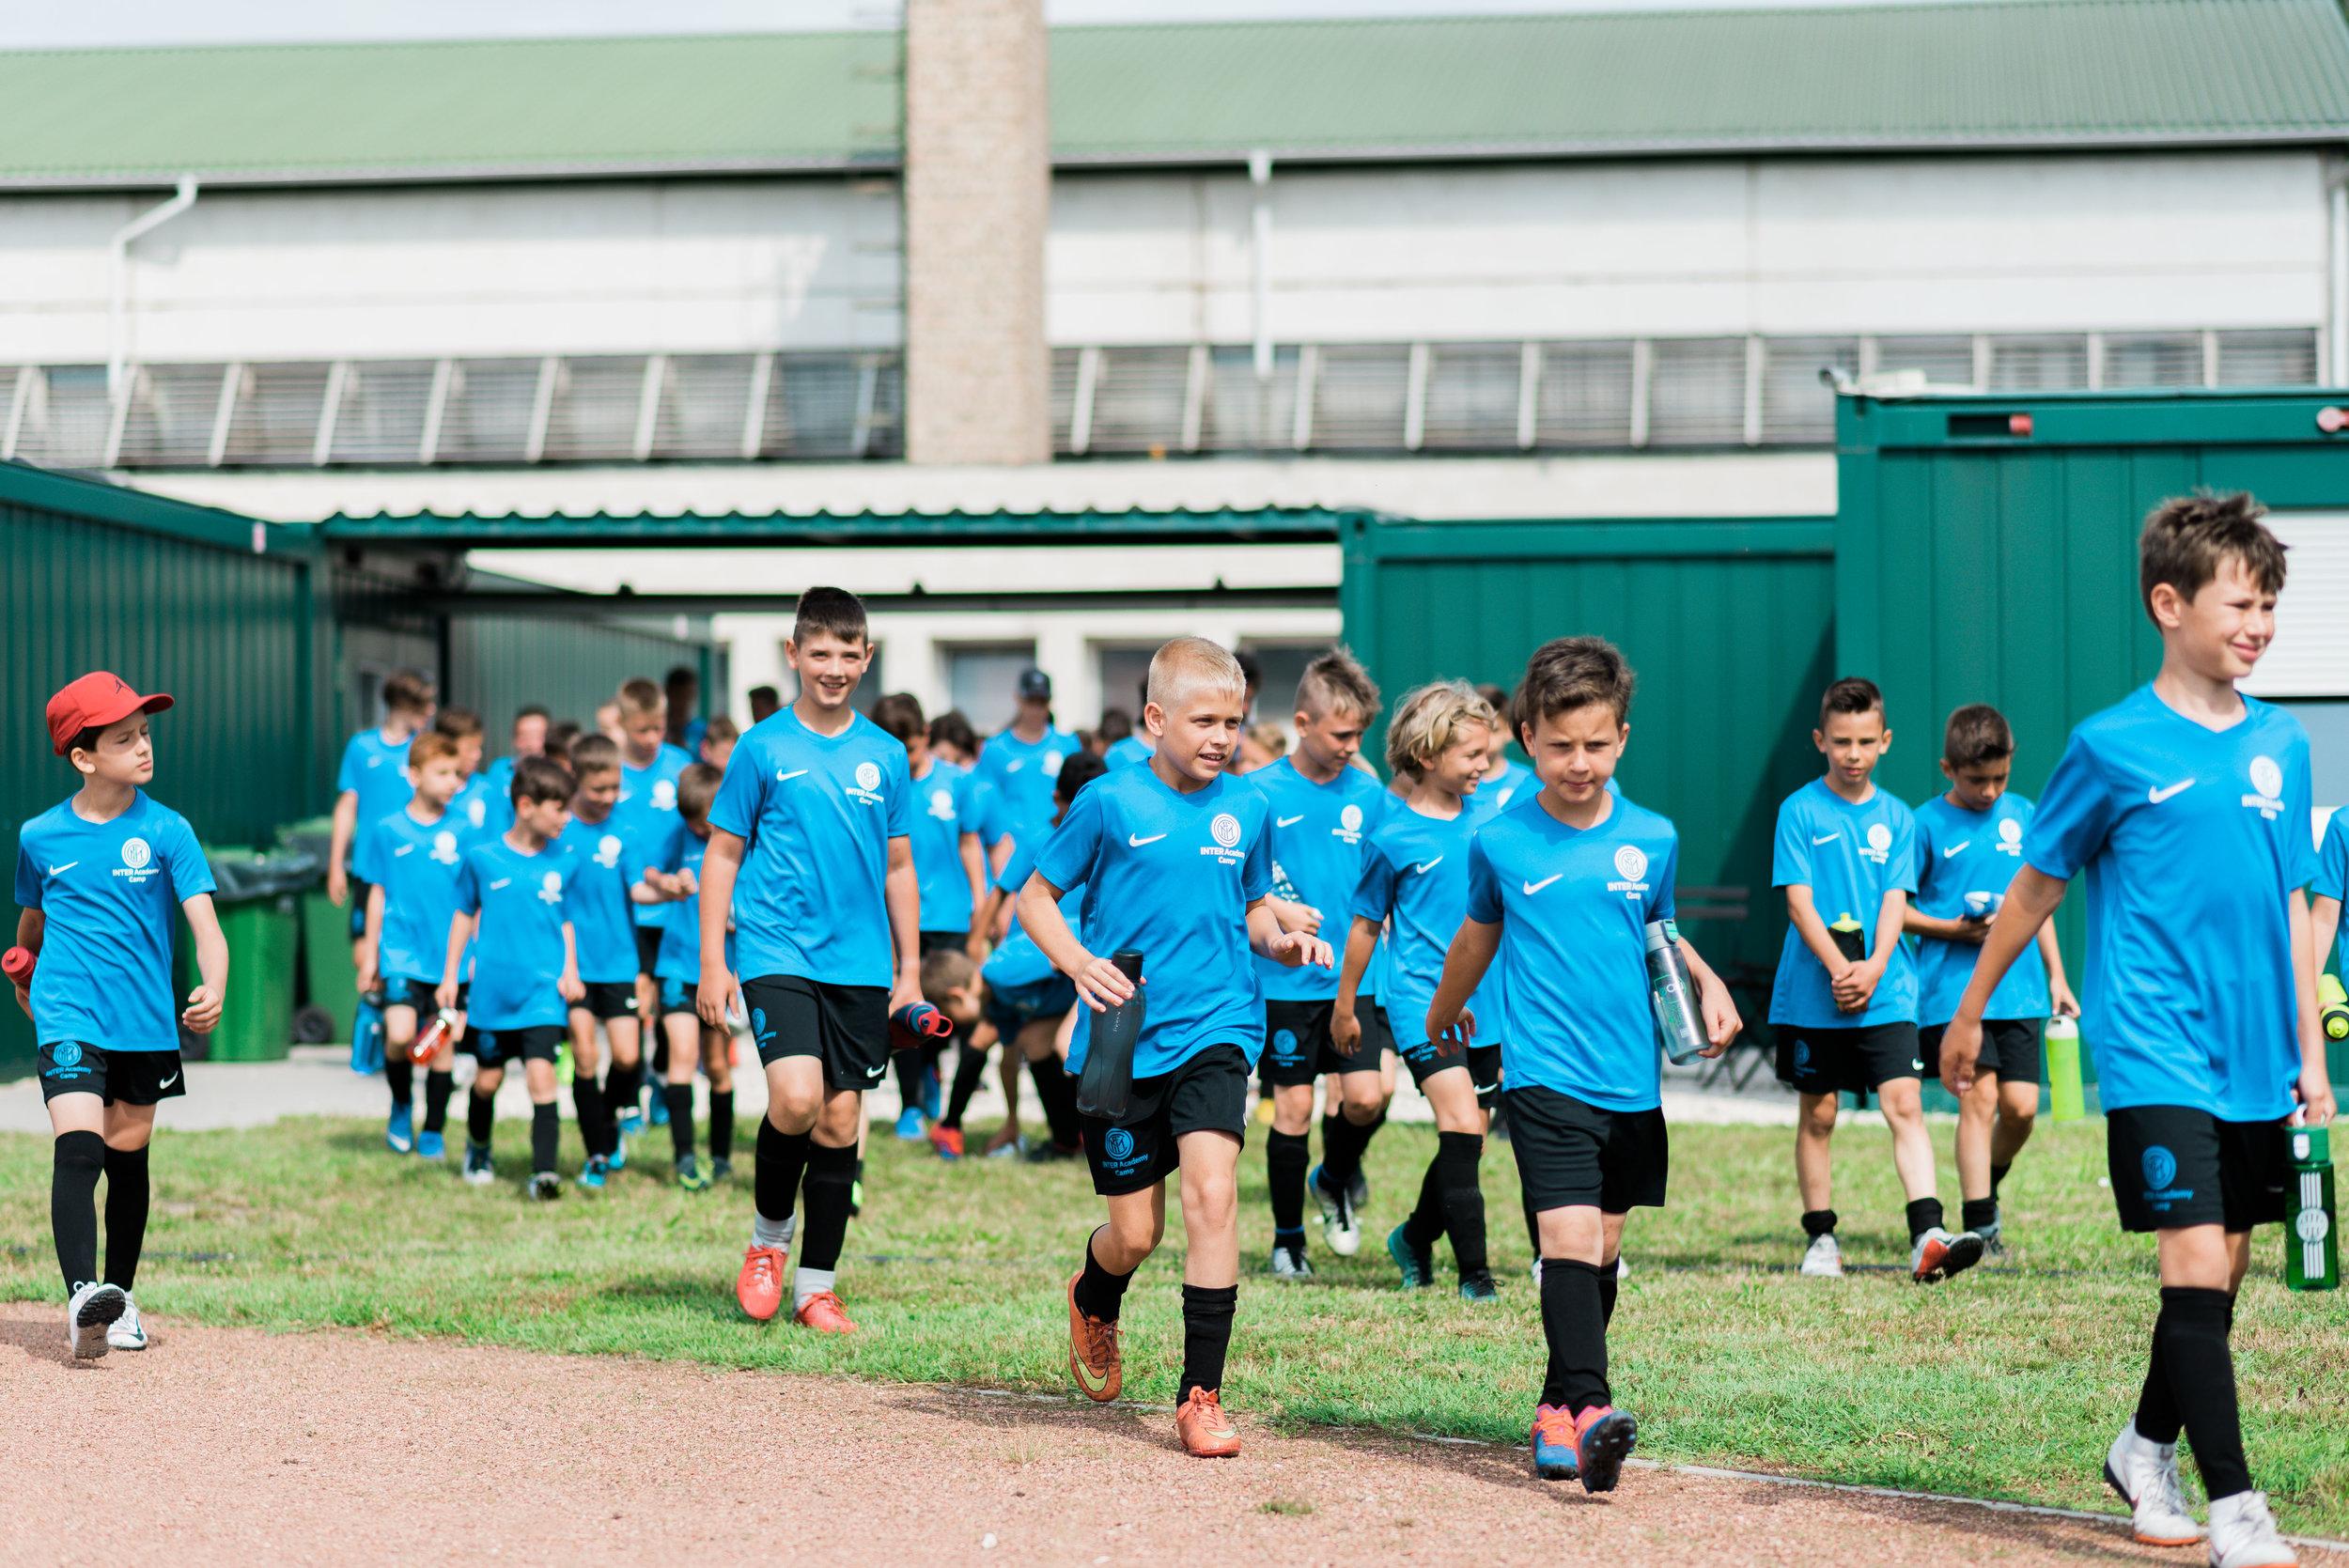 Dosa Gyozo_Inter Academy Camp Budapest-6.jpg